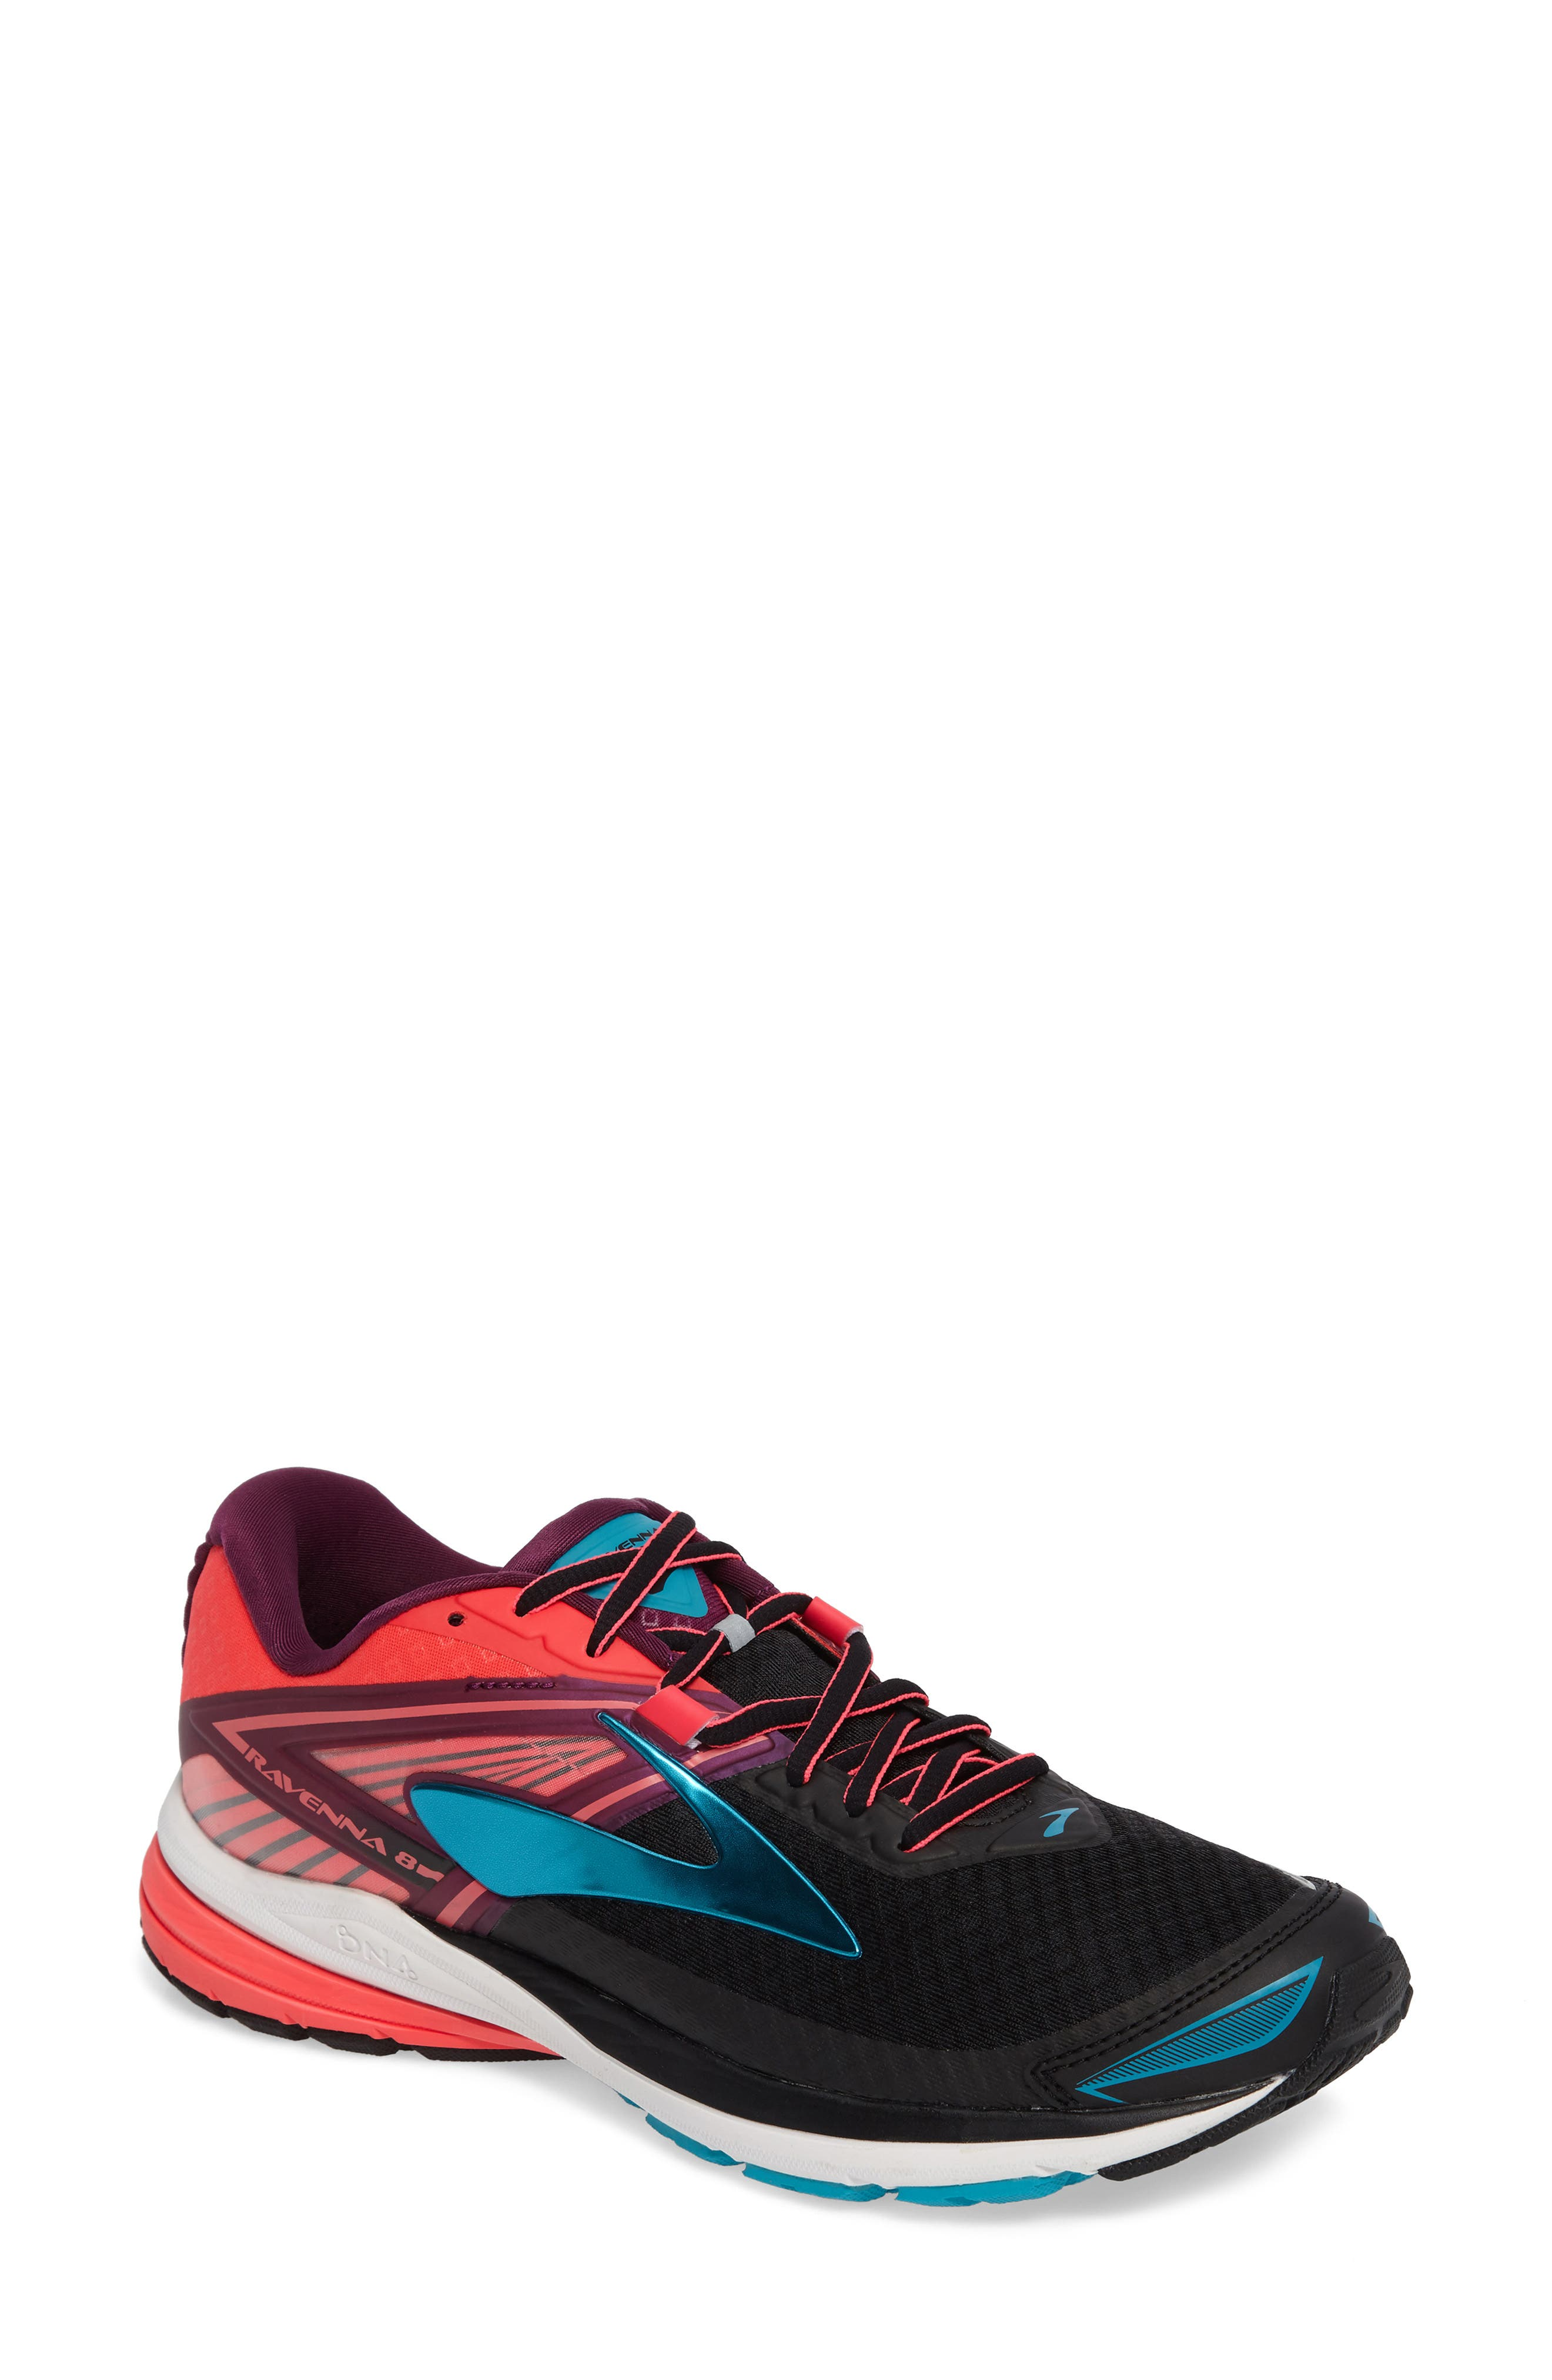 Ravenna 8 Running Shoe,                             Main thumbnail 1, color,                             013